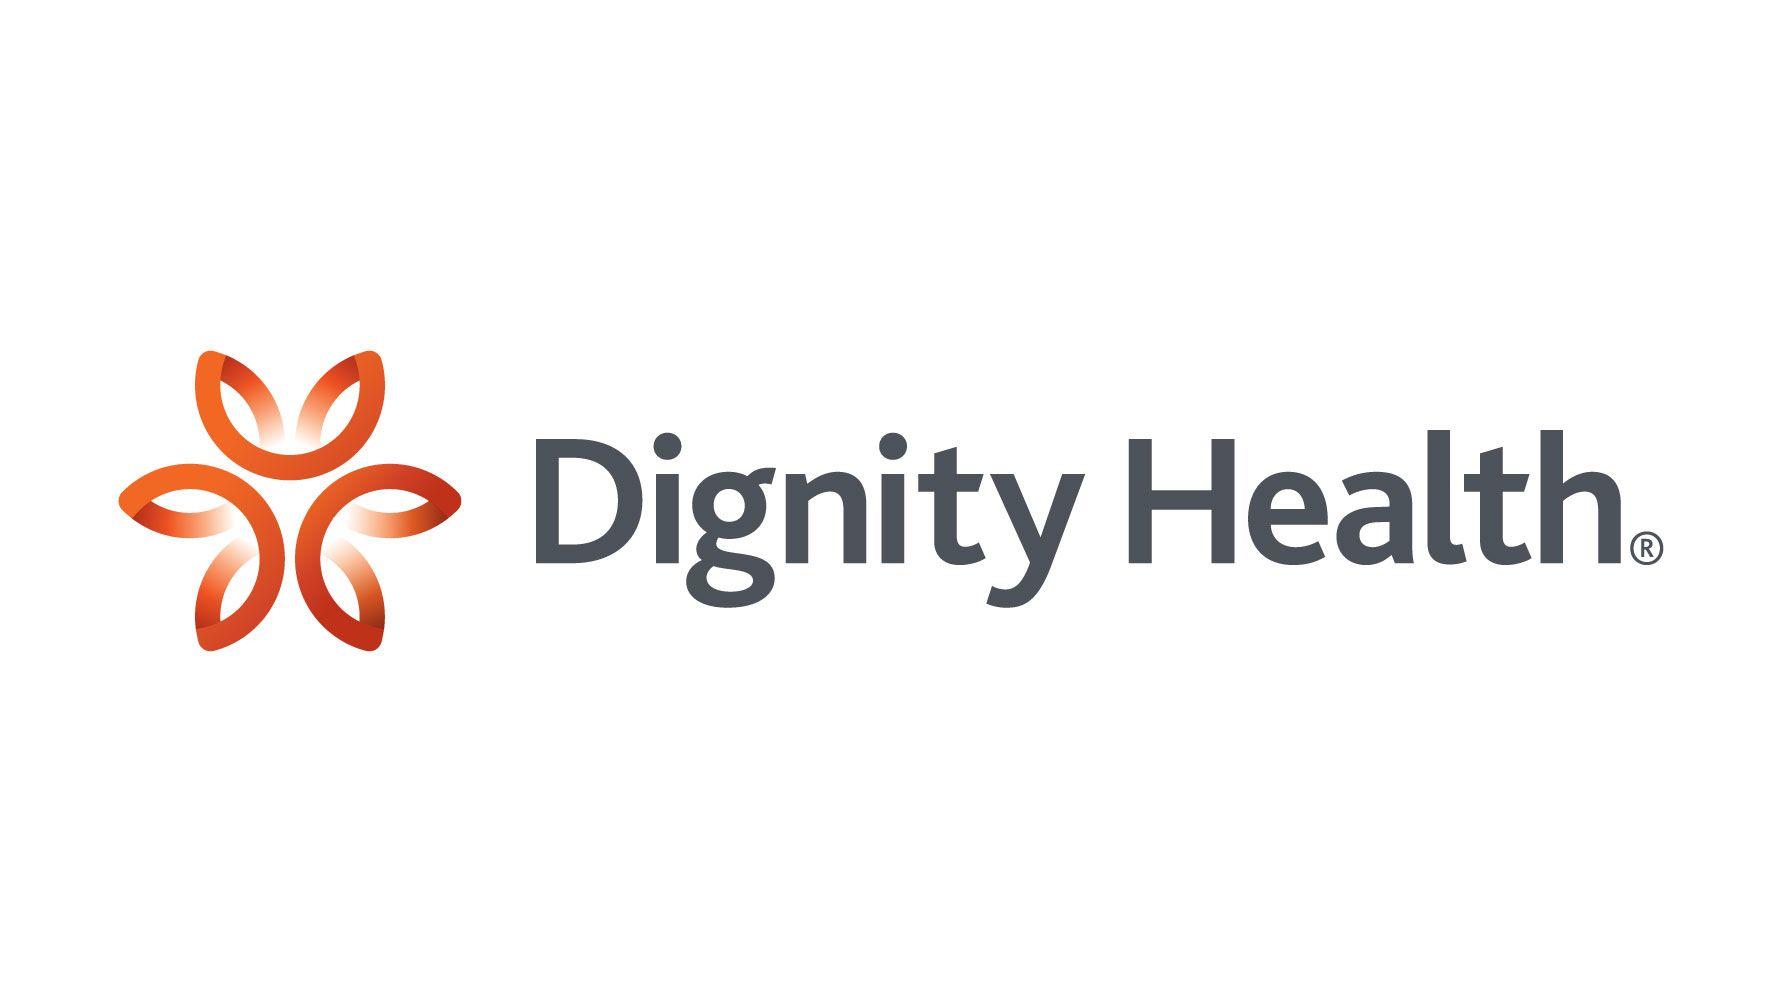 dignity-health-logo